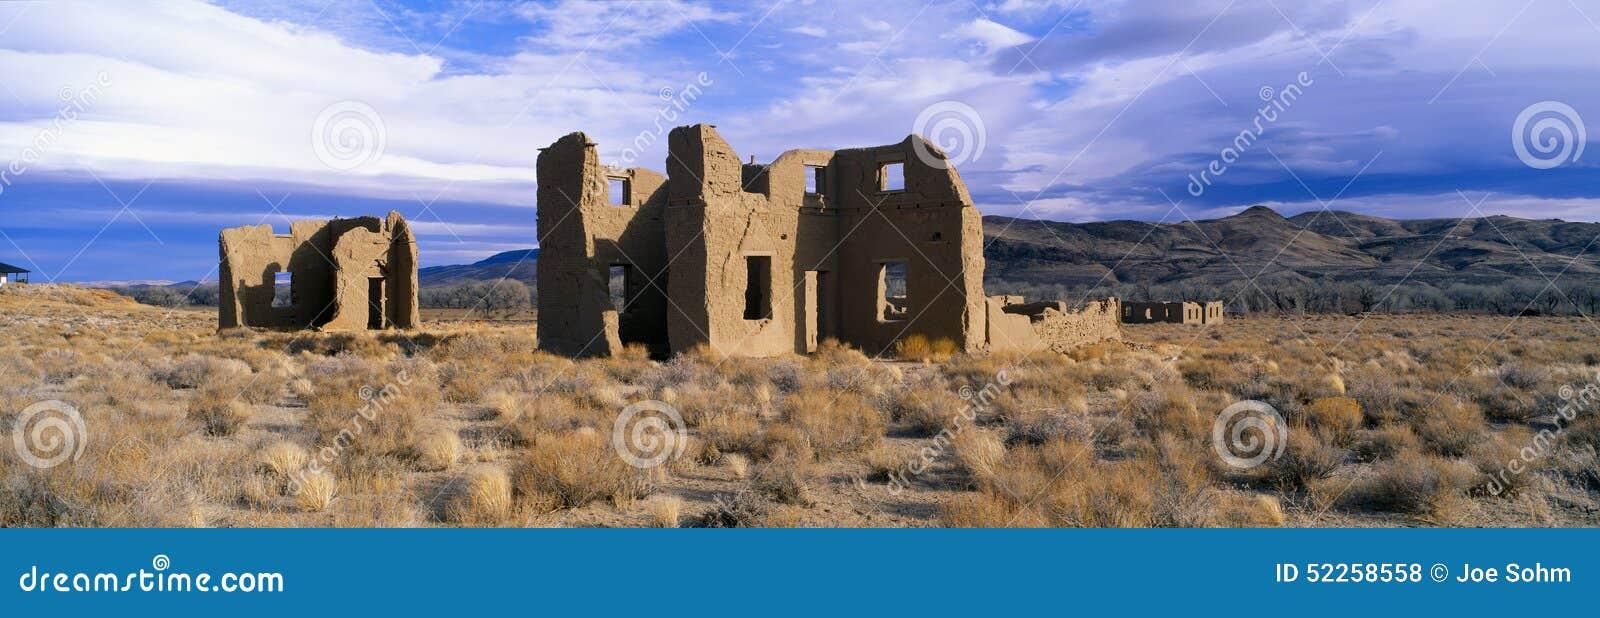 Cargo abandonado do exército, cerca de 1860, parque estadual de Churchill do forte, Nevada